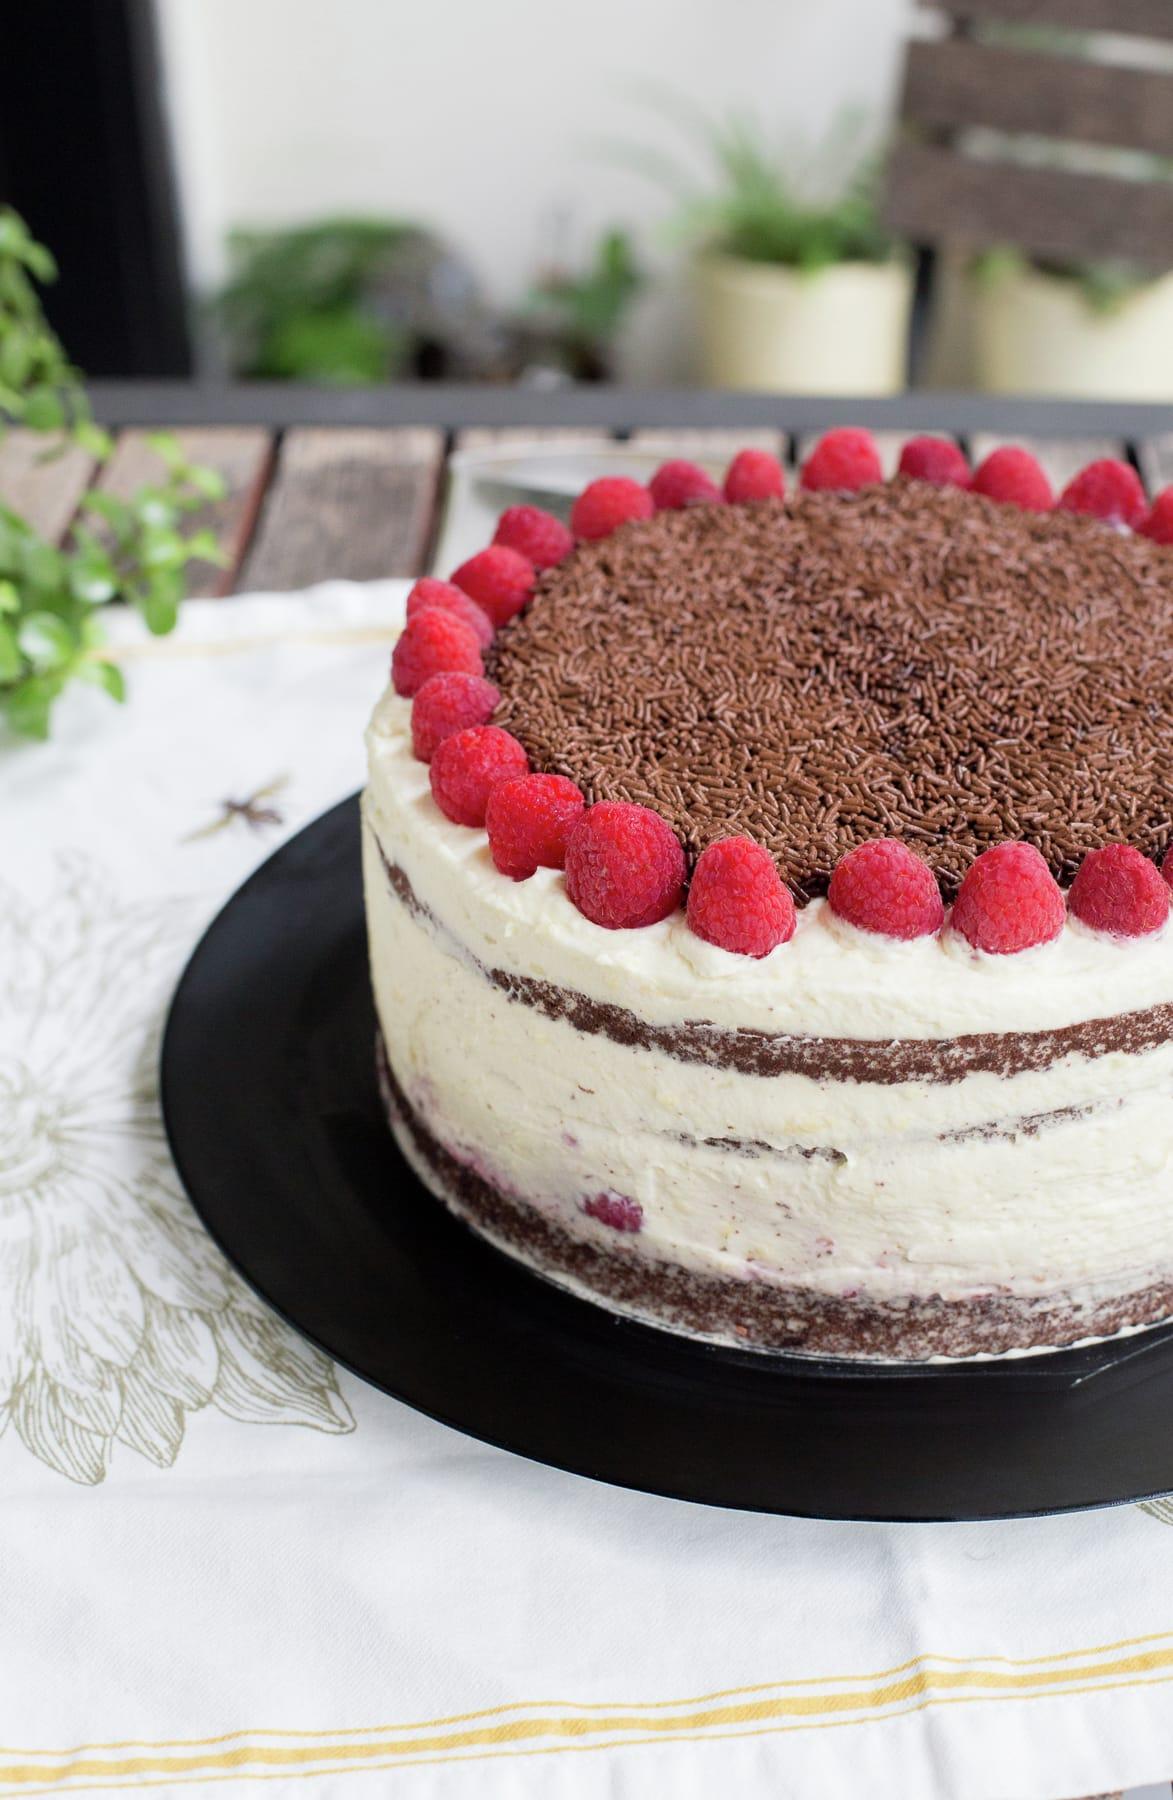 Raspberry Dulce de Leche Chocolate Cake